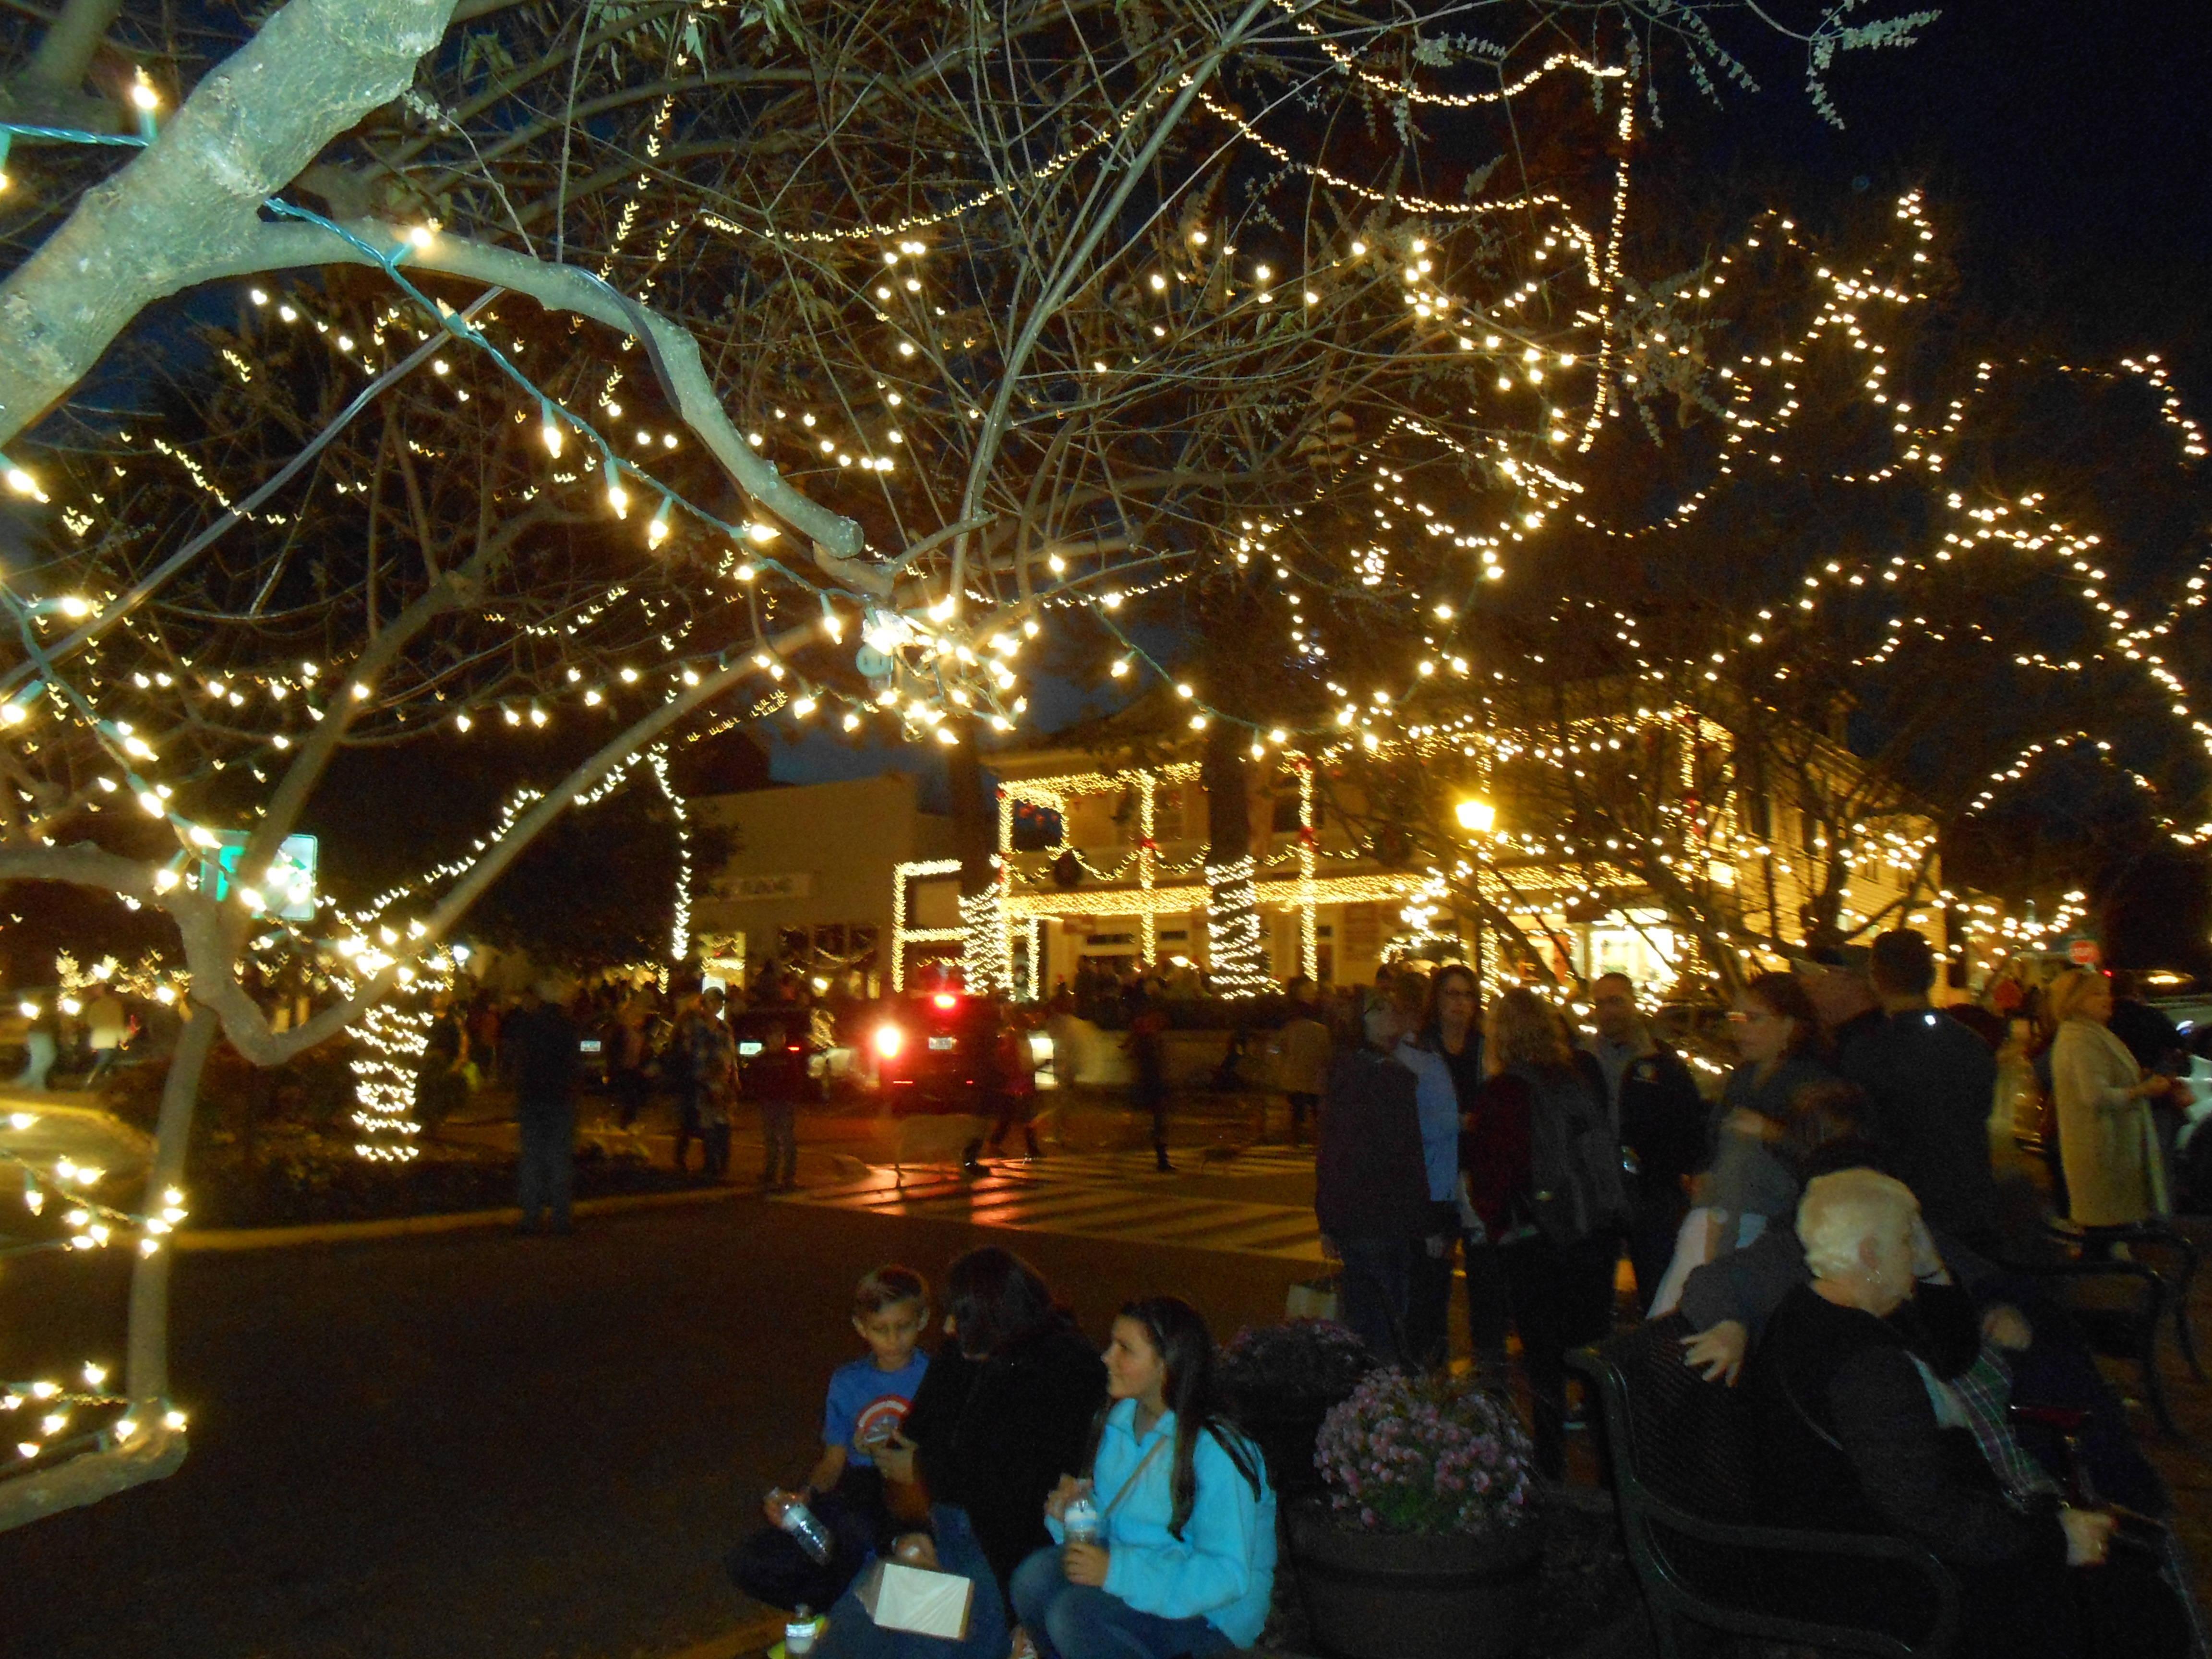 Dahlonega Ga Christmas.Merry Christmas From The North Georgia Mountains